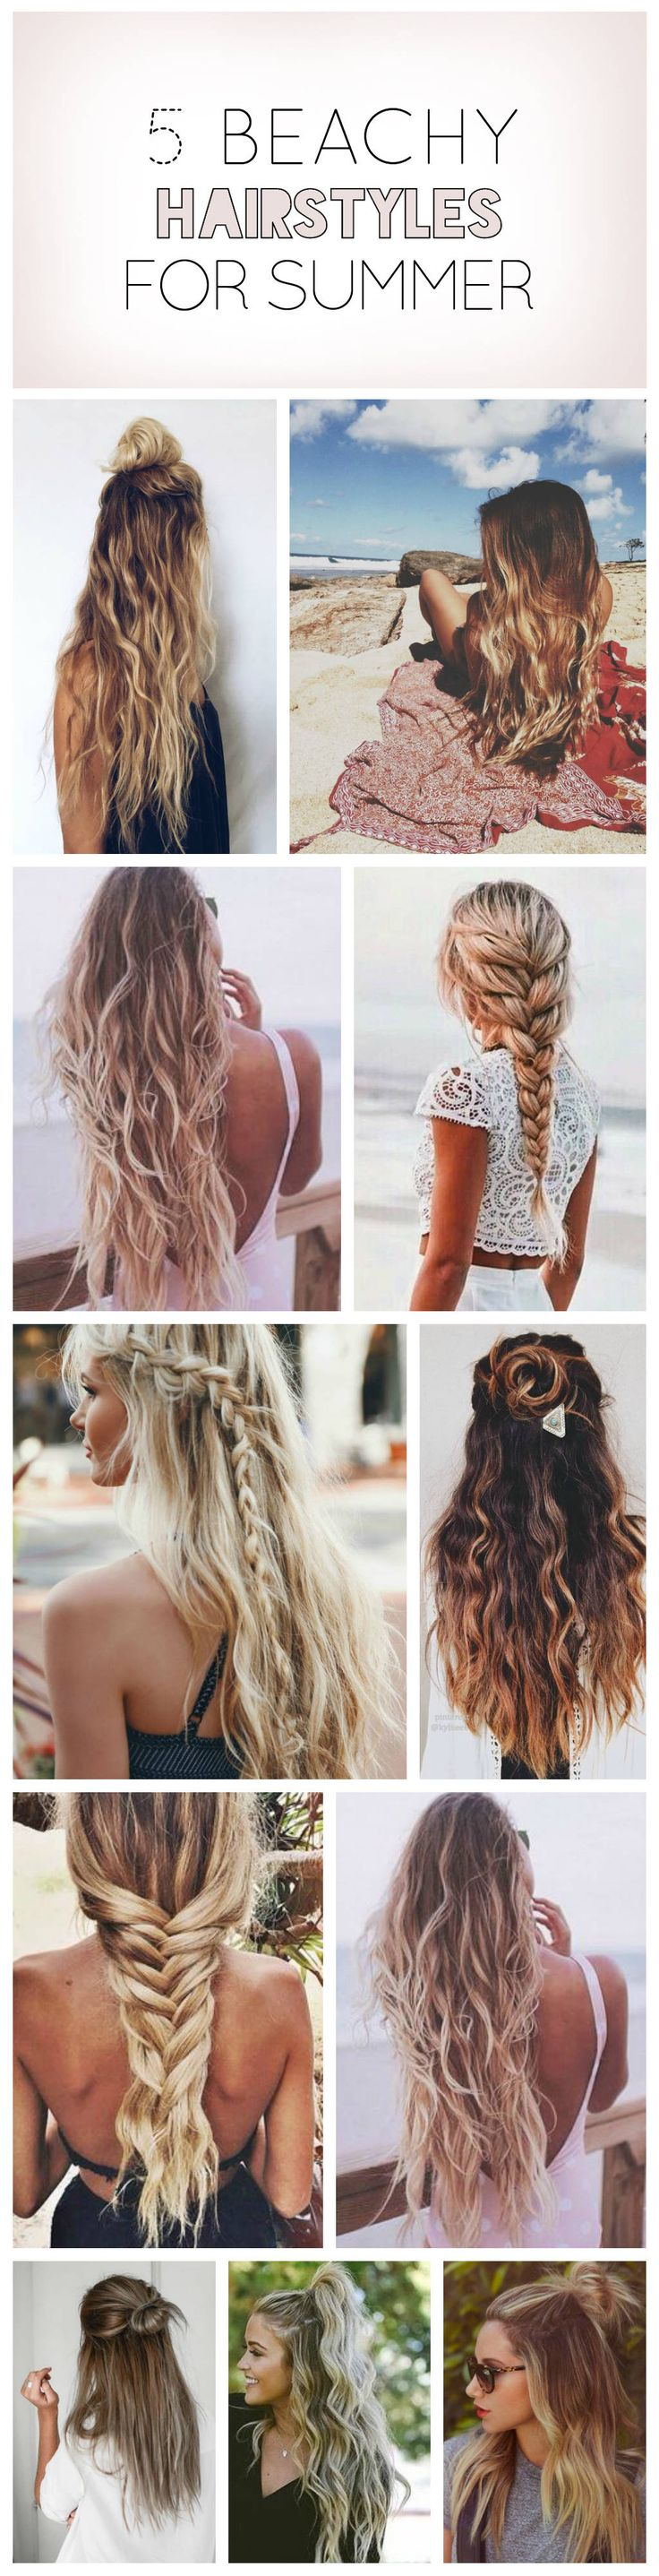 Miraculous 1000 Ideas About Summer Hairstyles On Pinterest Easy Summer Short Hairstyles Gunalazisus